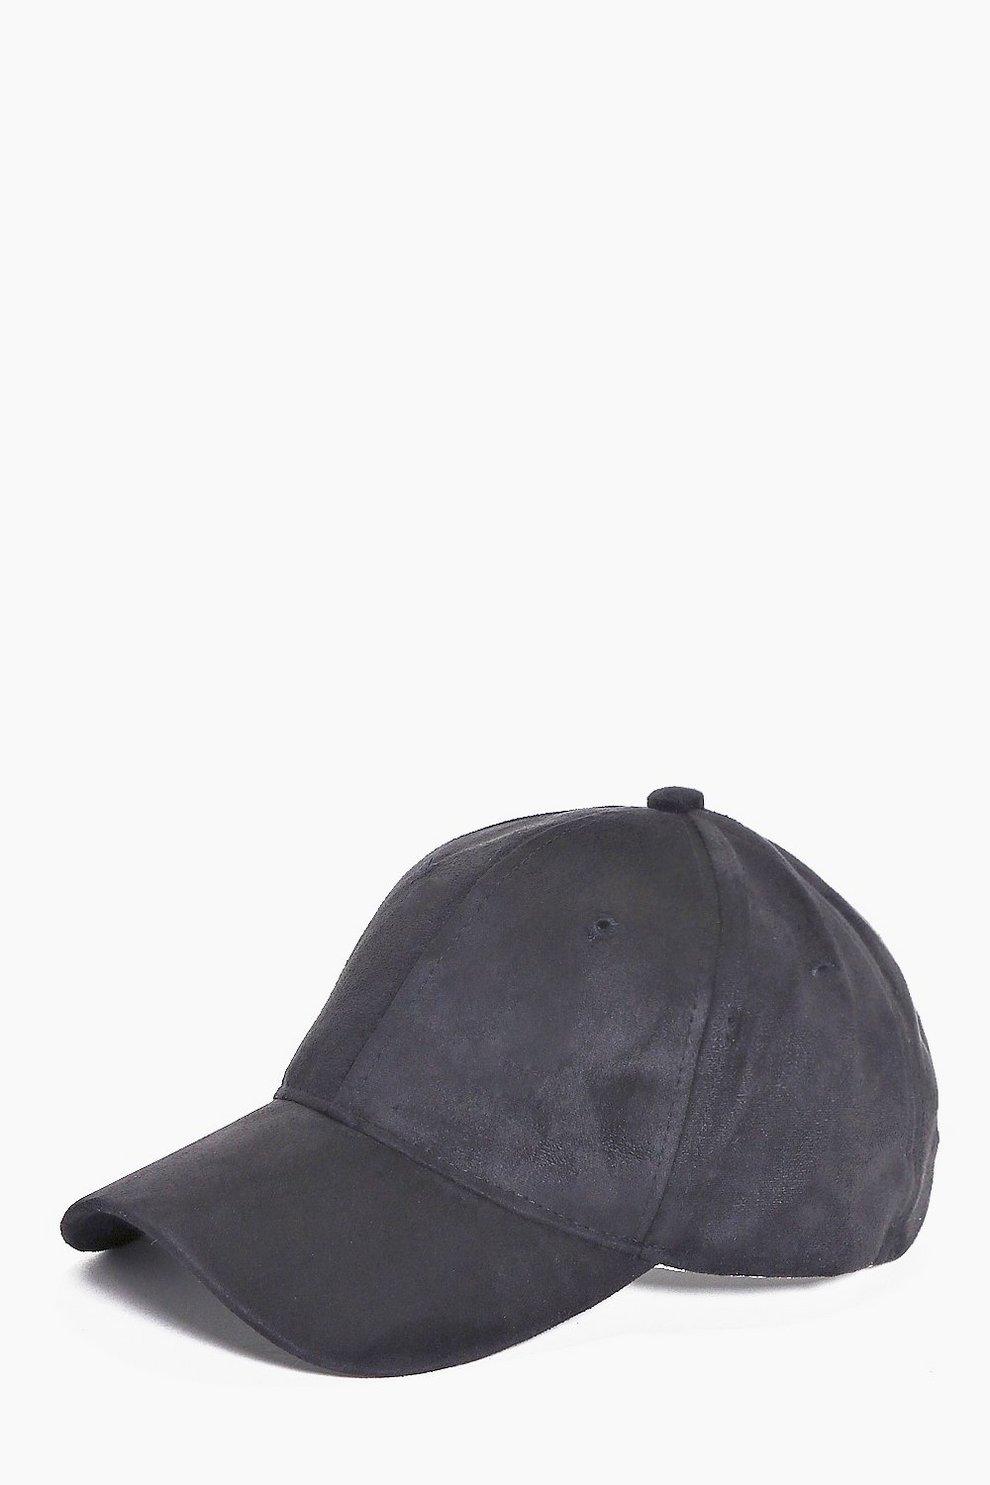 284469c14a3 Black Faux Suede Baseball Cap